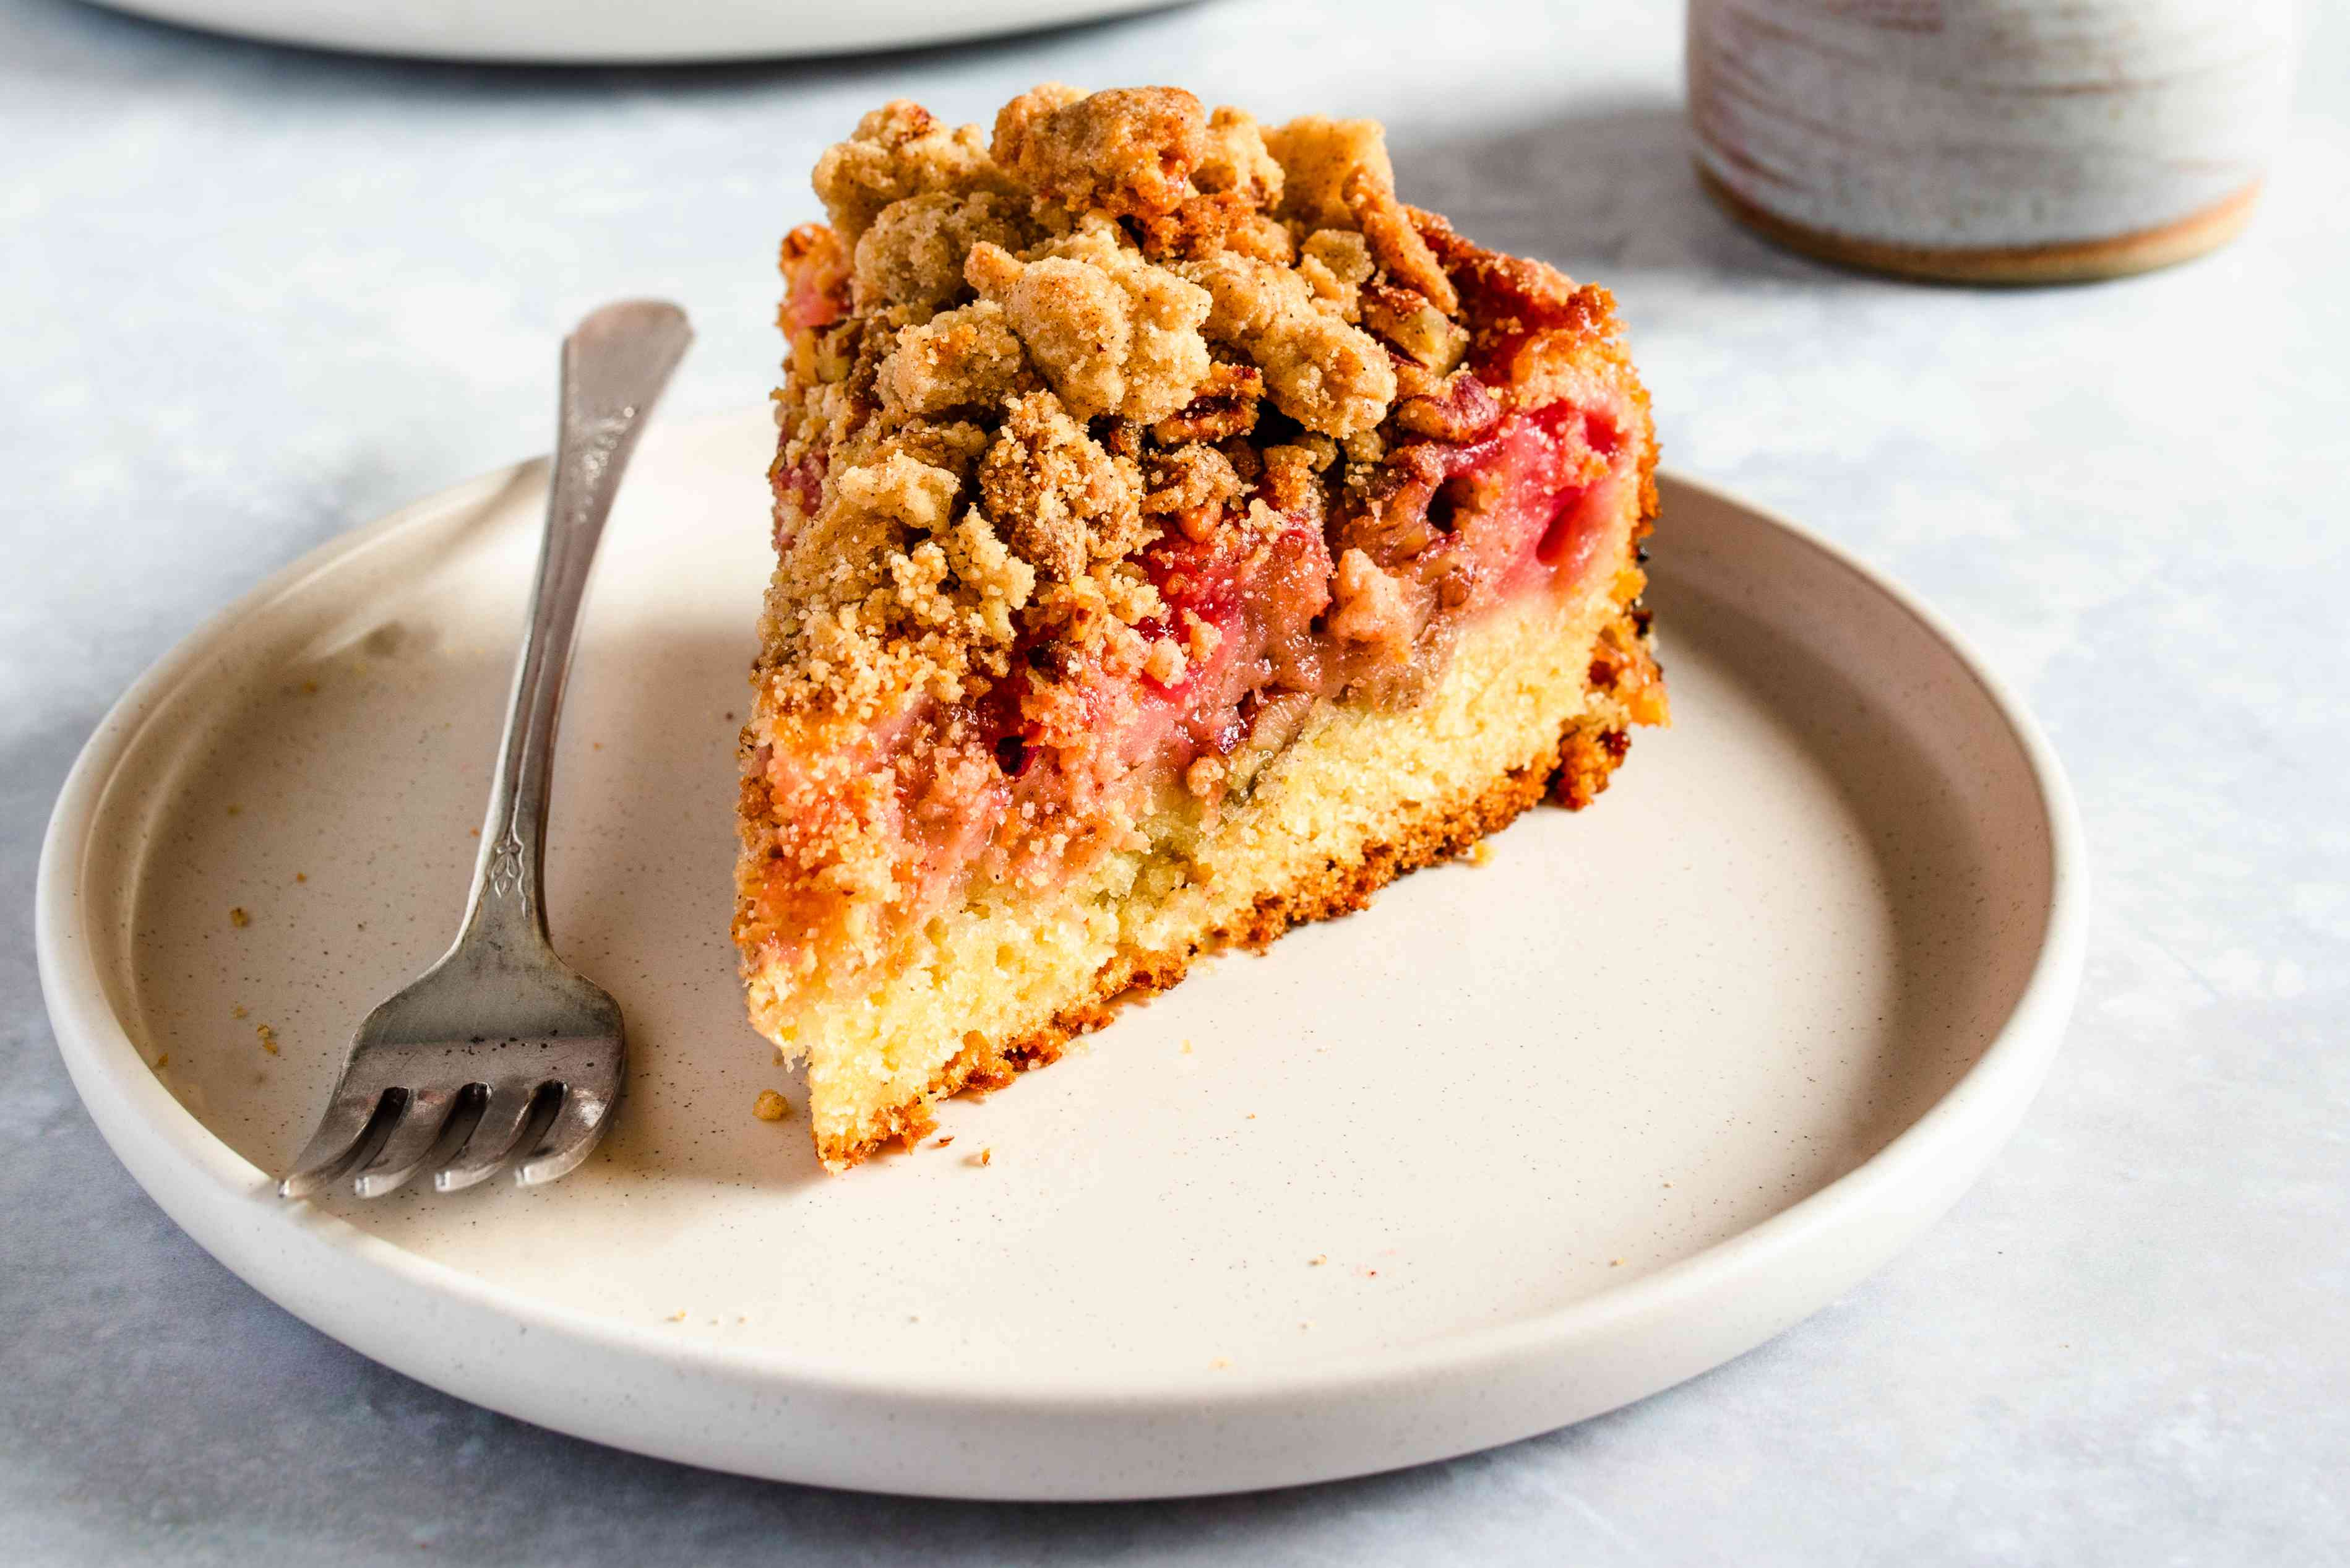 Strawberry rhubarb cake recipe